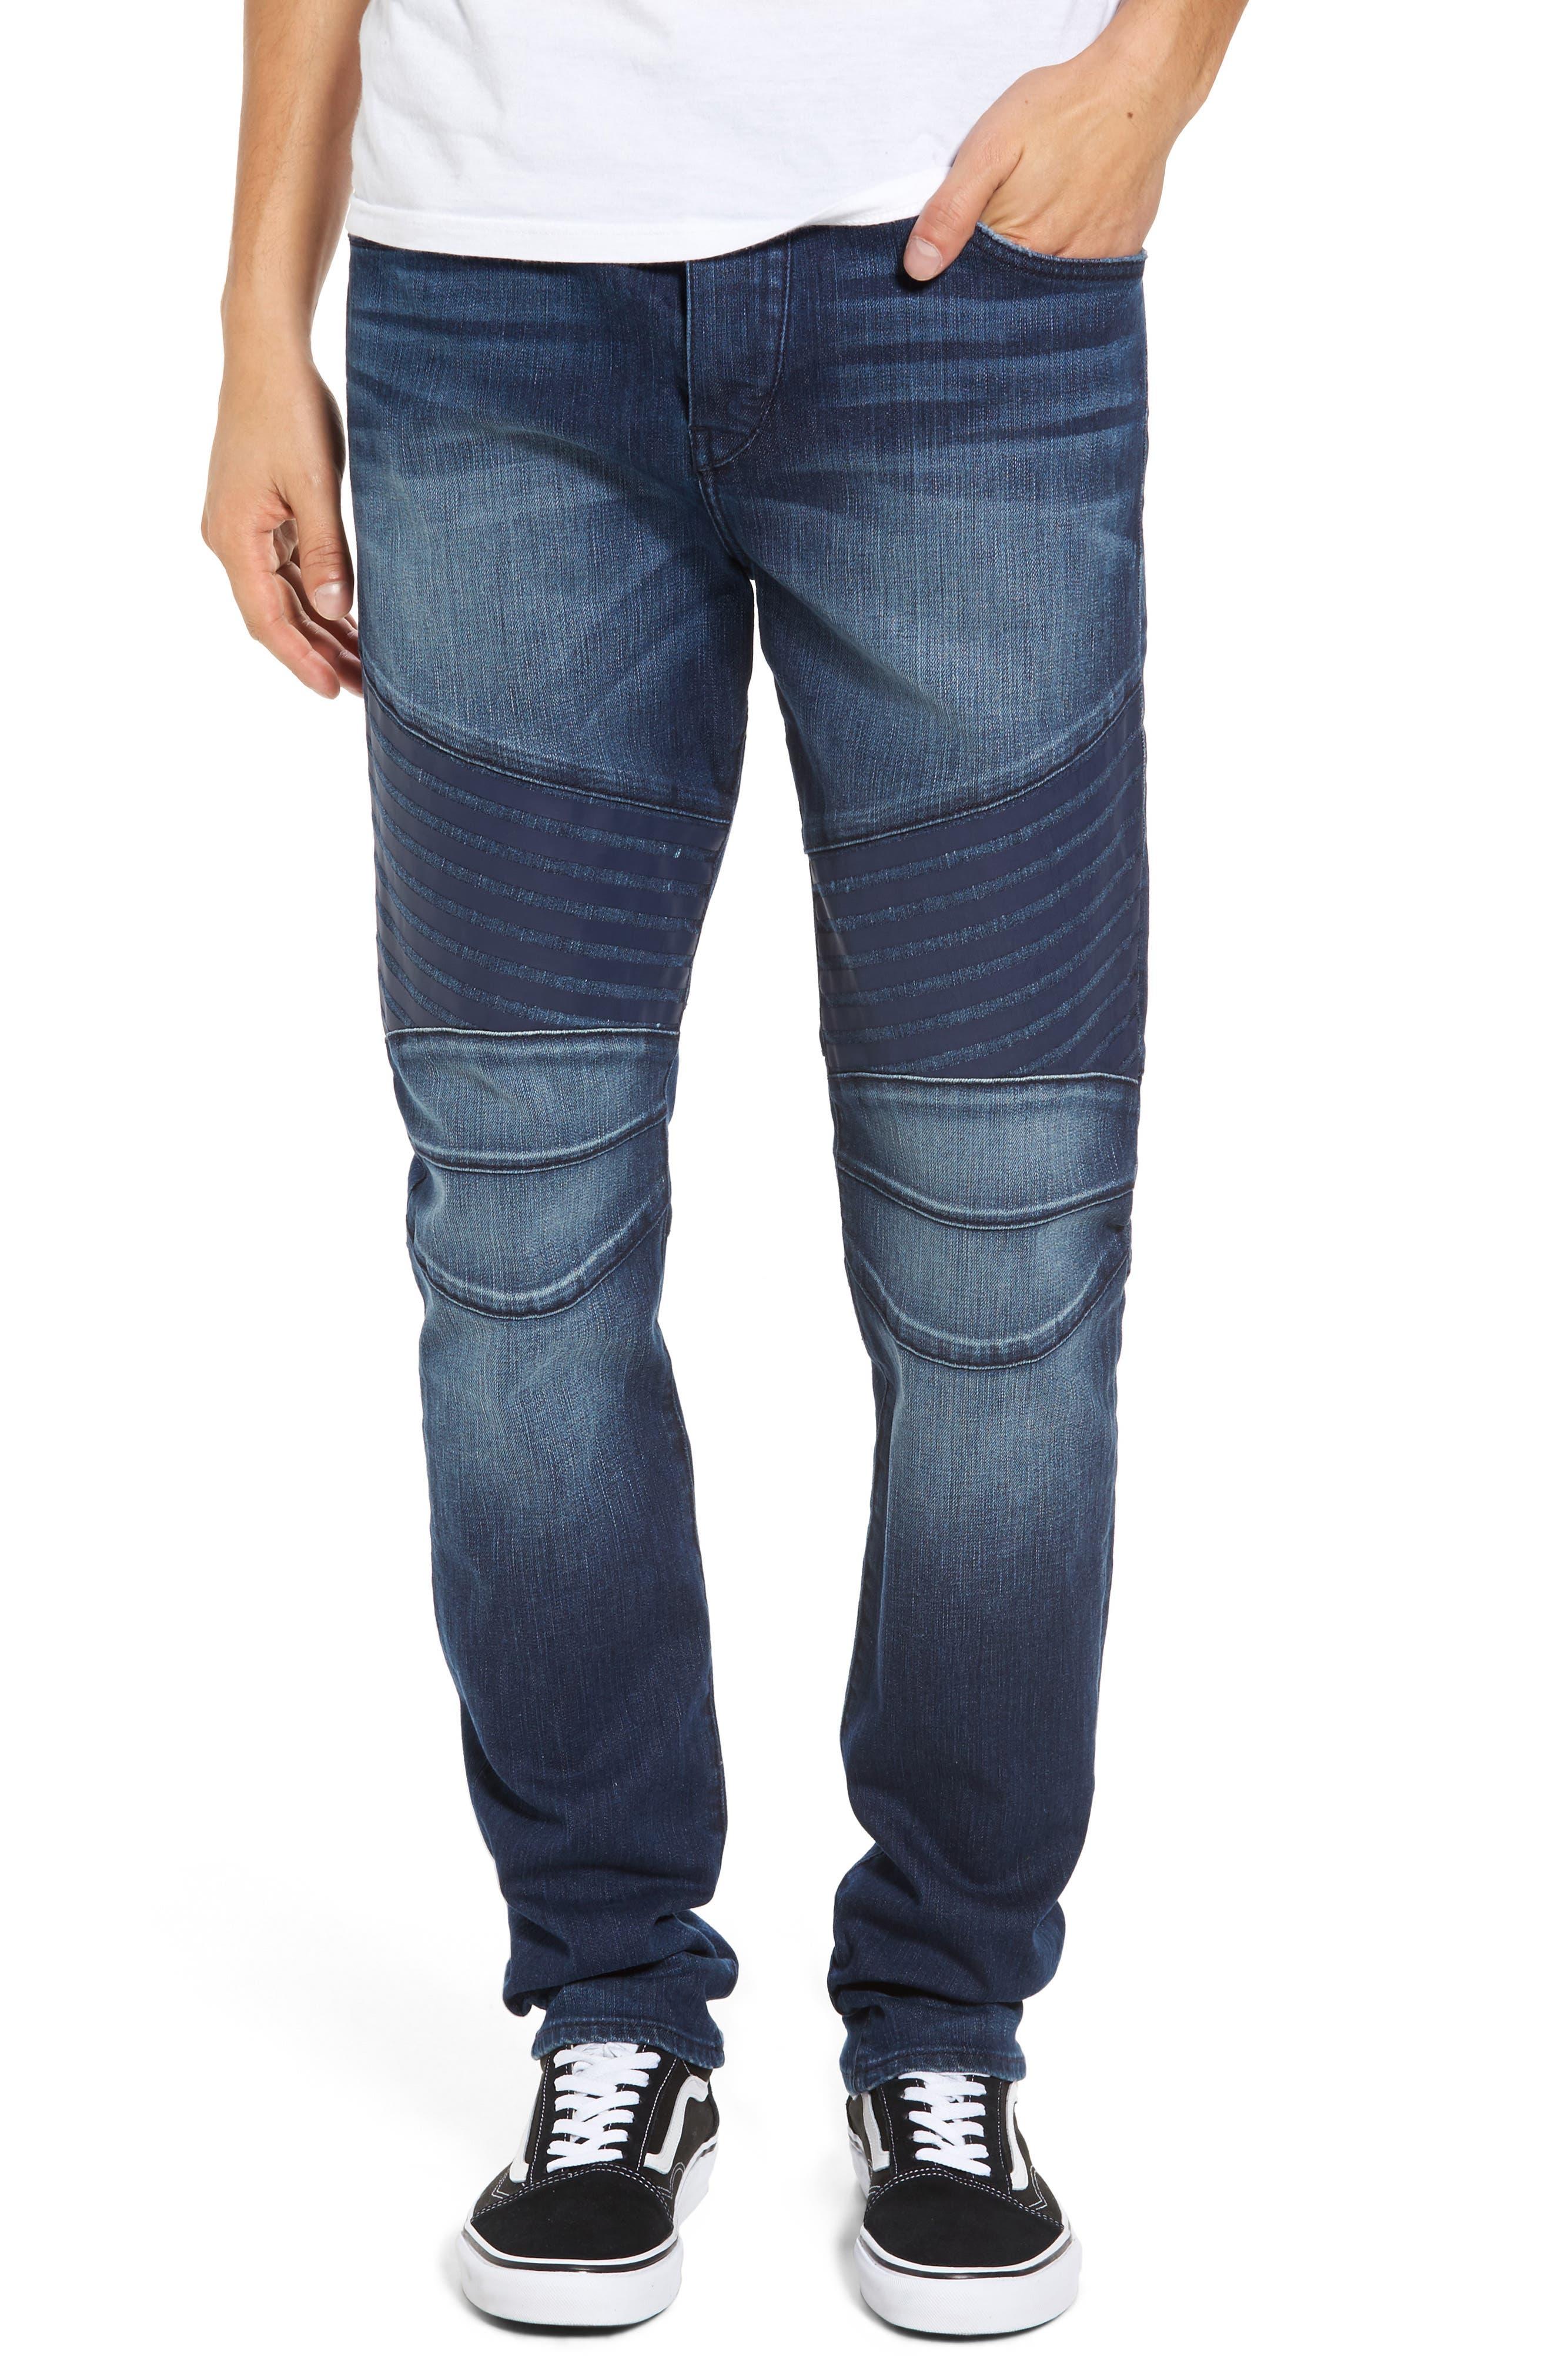 Main Image - True Religion Brand Jeans Rocco Biker Skinny Fit Jeans (Rebel Race)